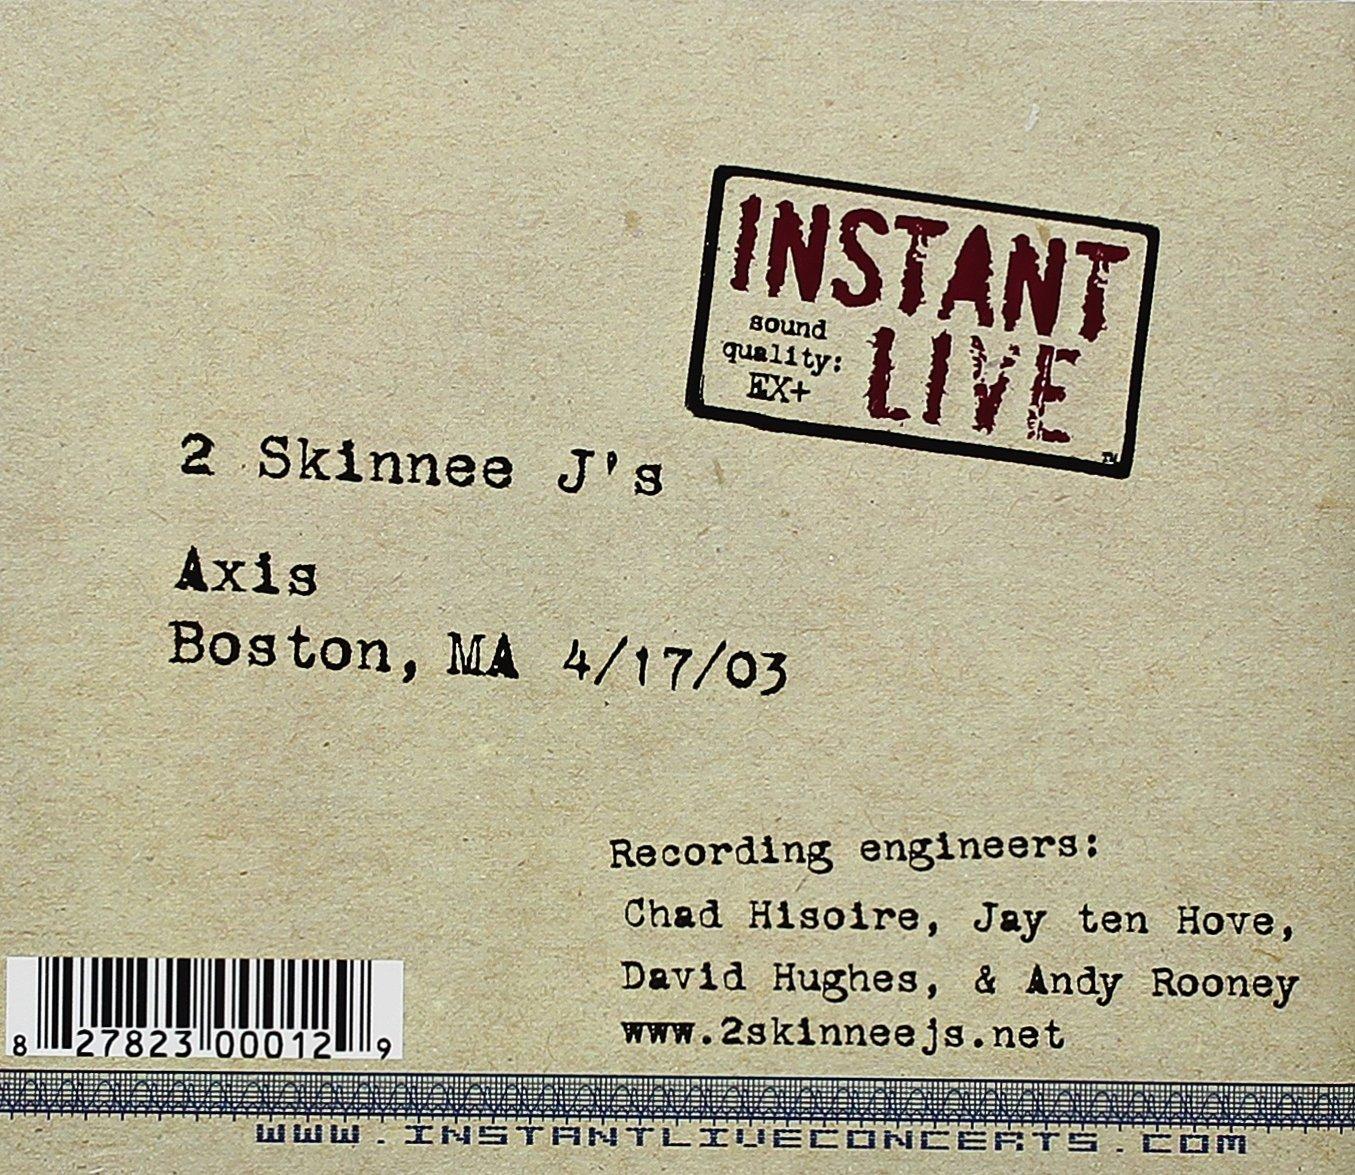 Instant Live: Boston, MA Axis 04-17-03